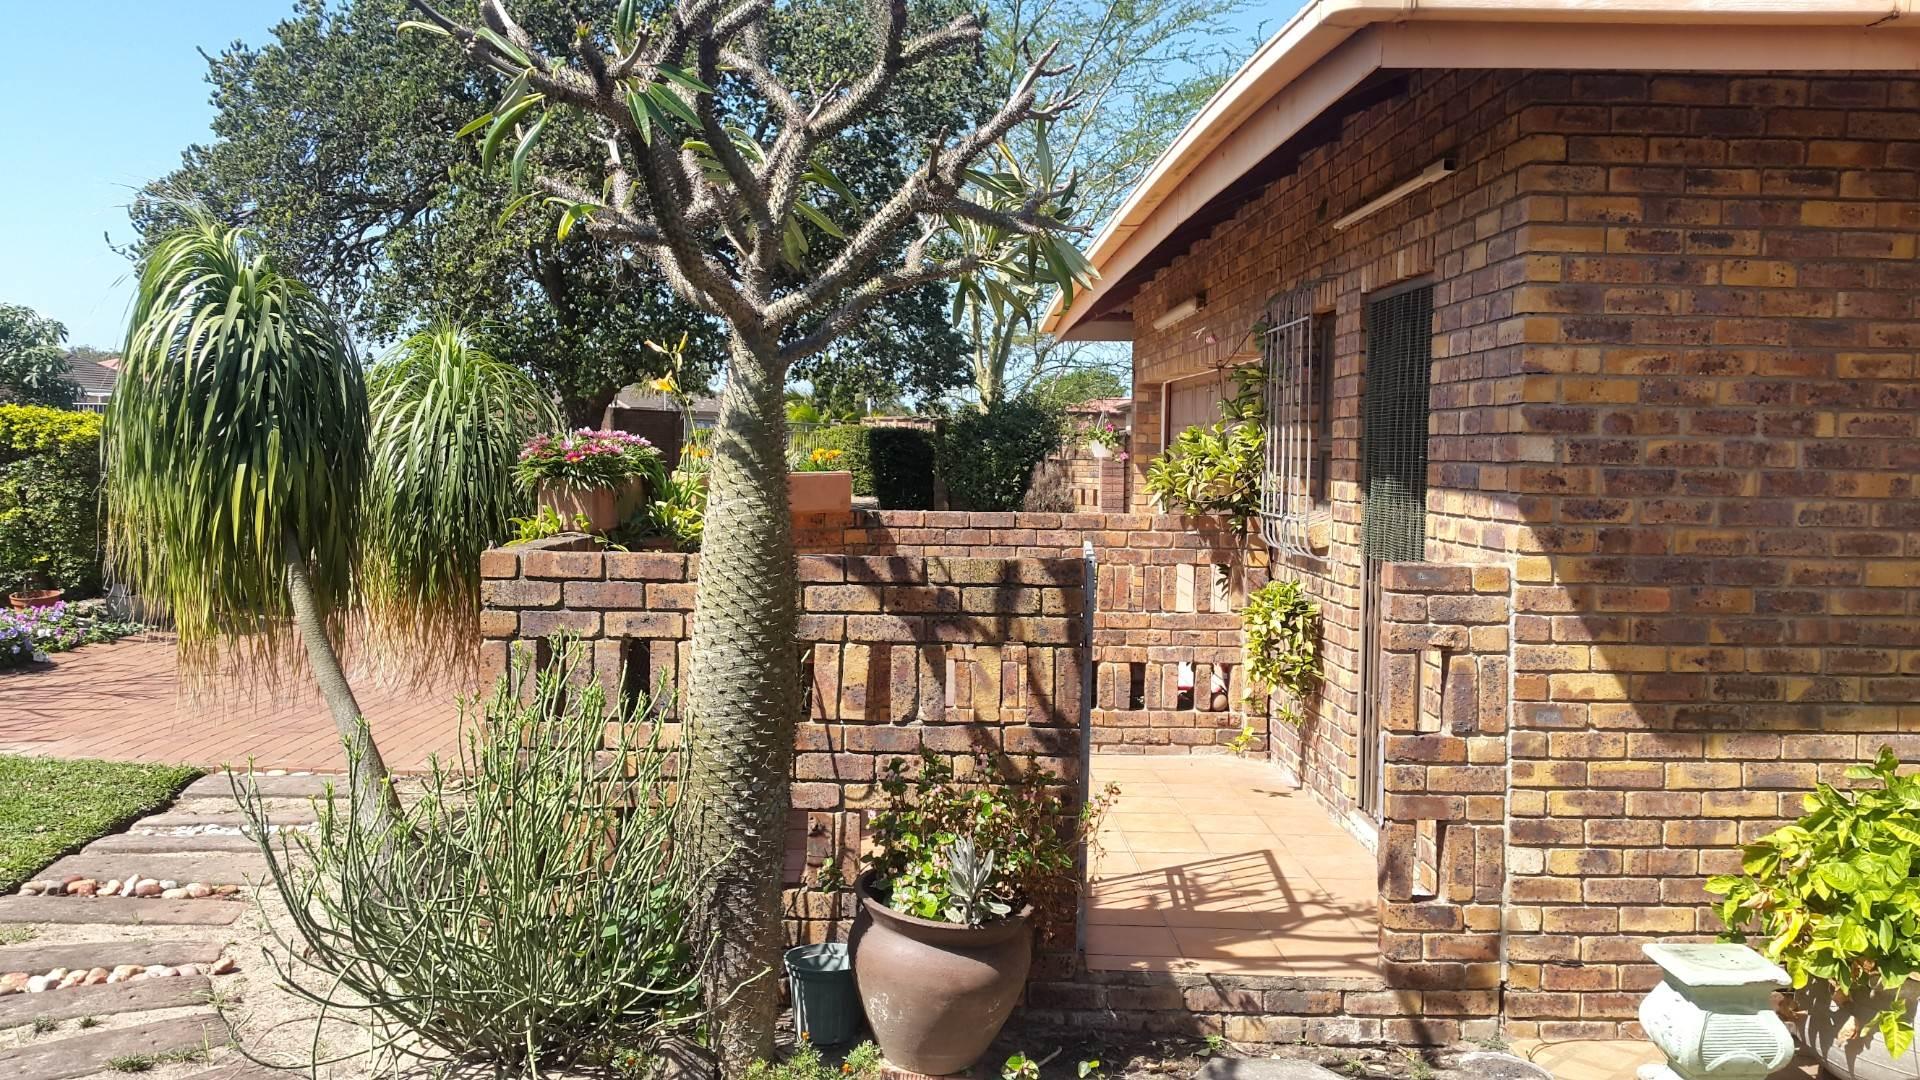 3 BedroomTownhouse For Sale In Birdswood